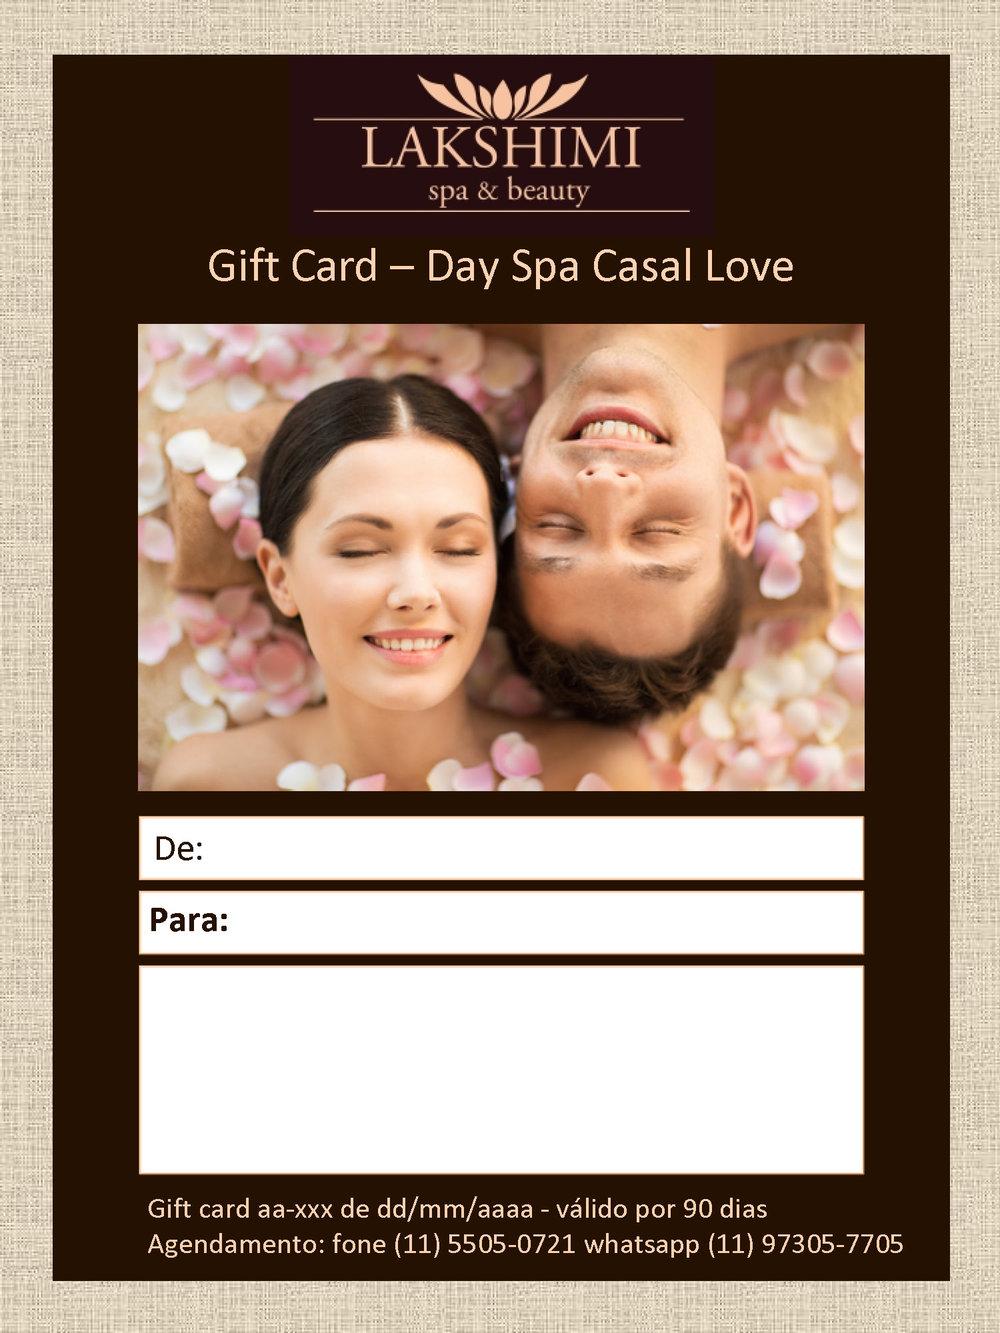 MODELO DE GIFT CARD VIRTUAL LAKSHIMI